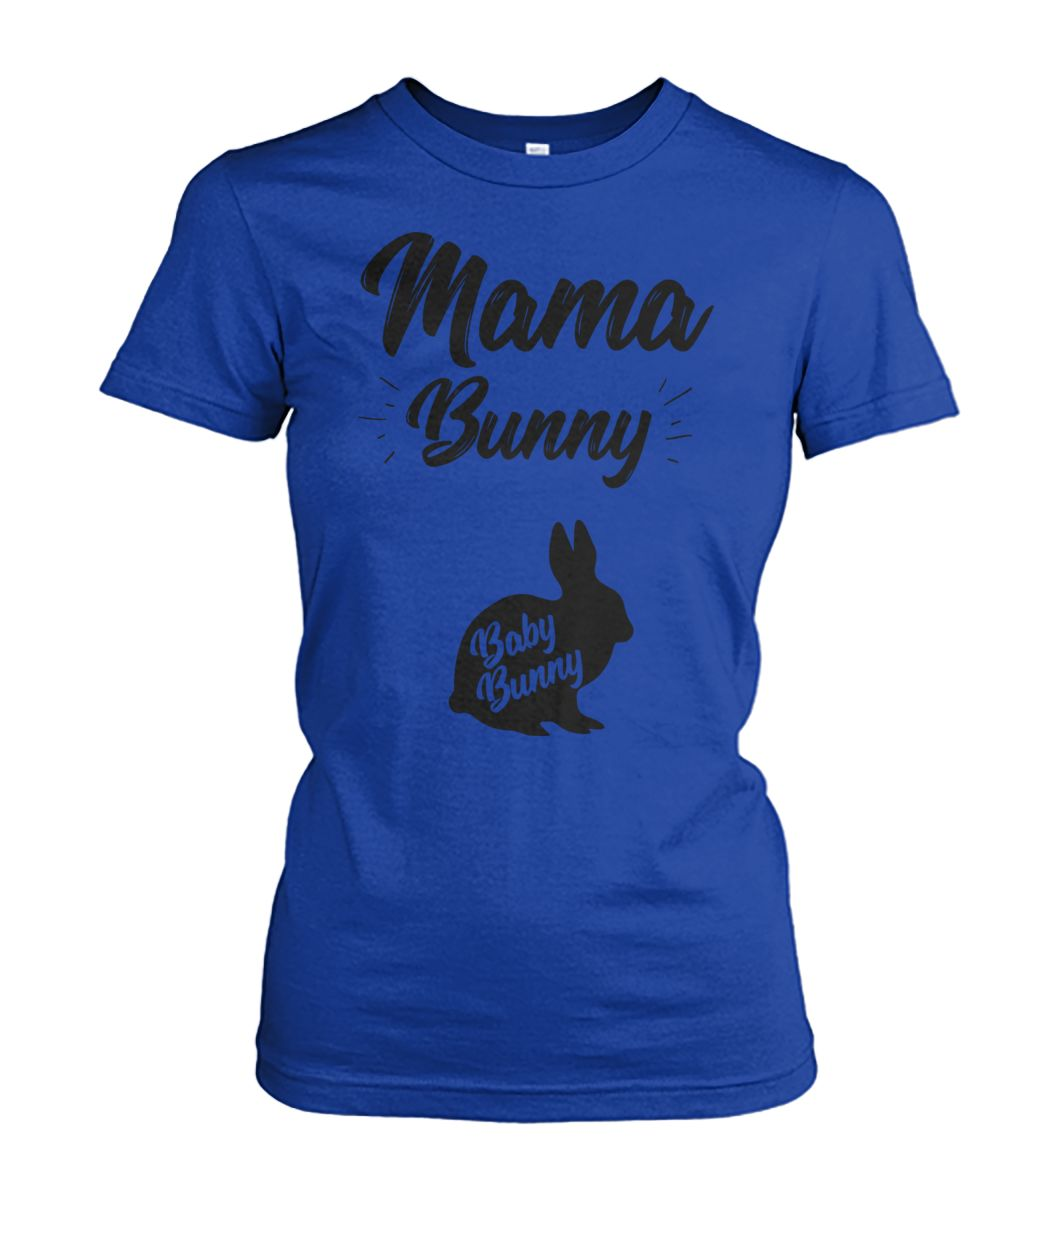 [Hot version] Mama bunny baby bunny easter pregnancy shirt